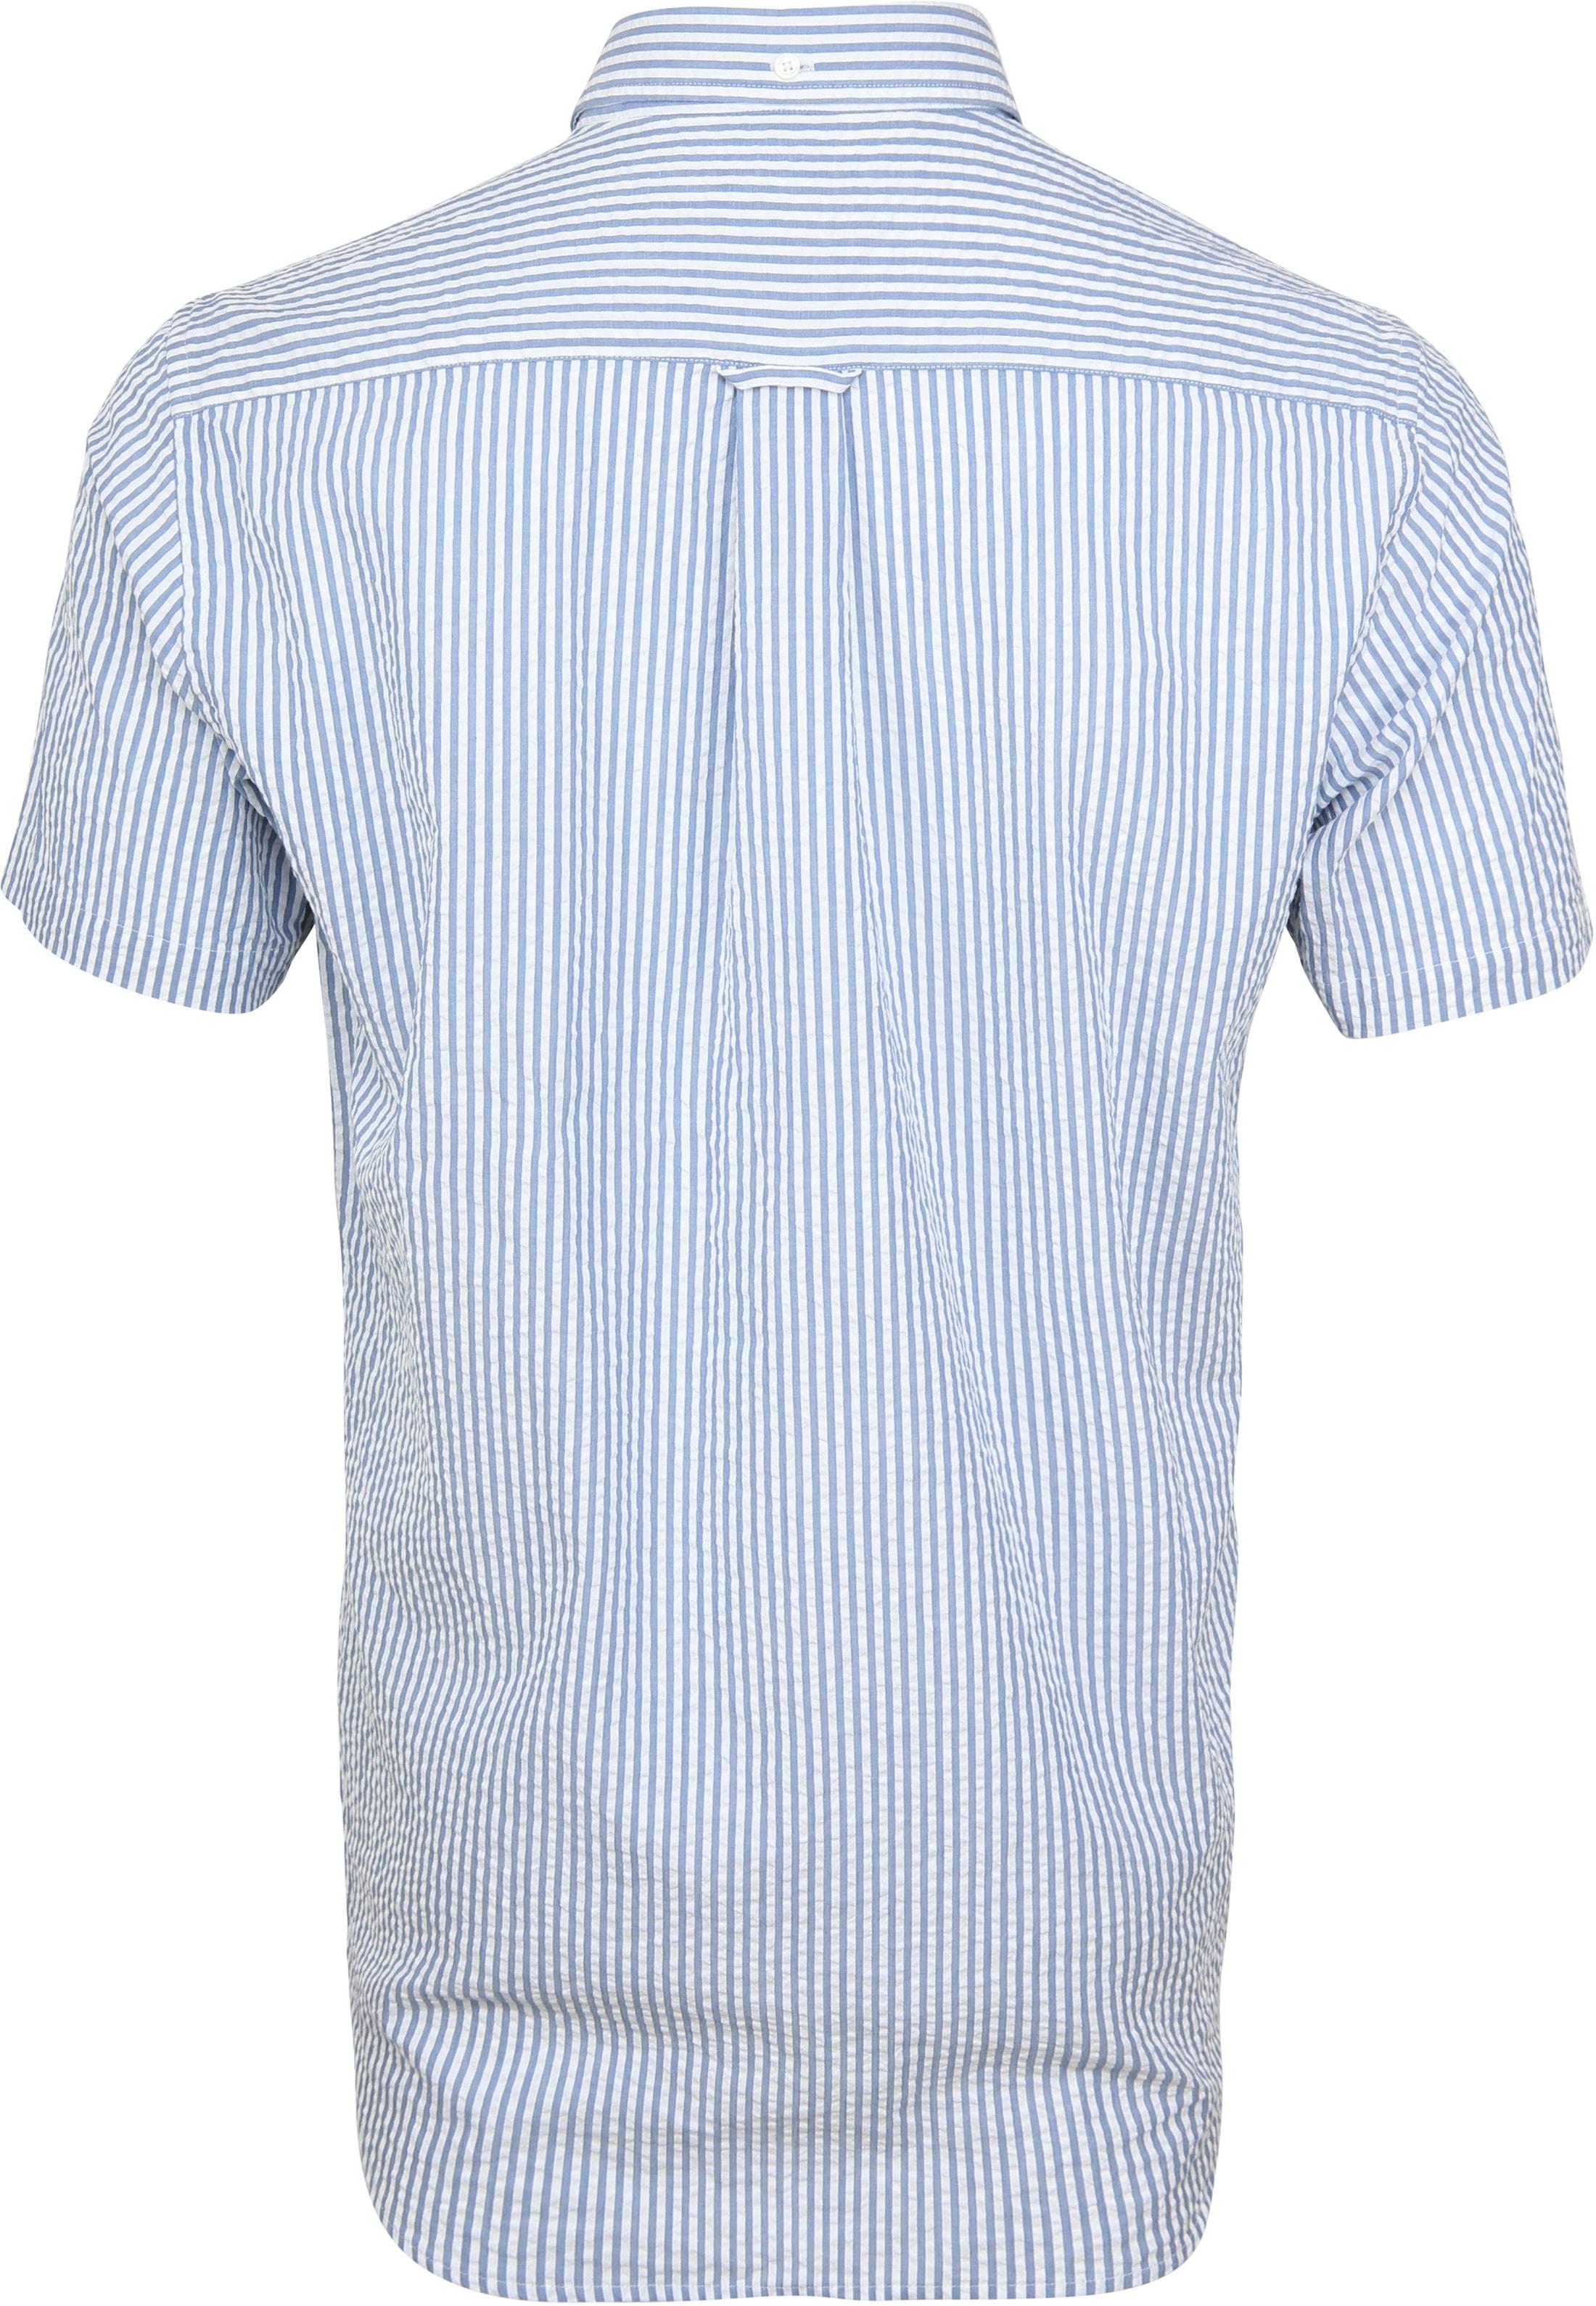 Gant Overhemd SS Seersucker Streep foto 3